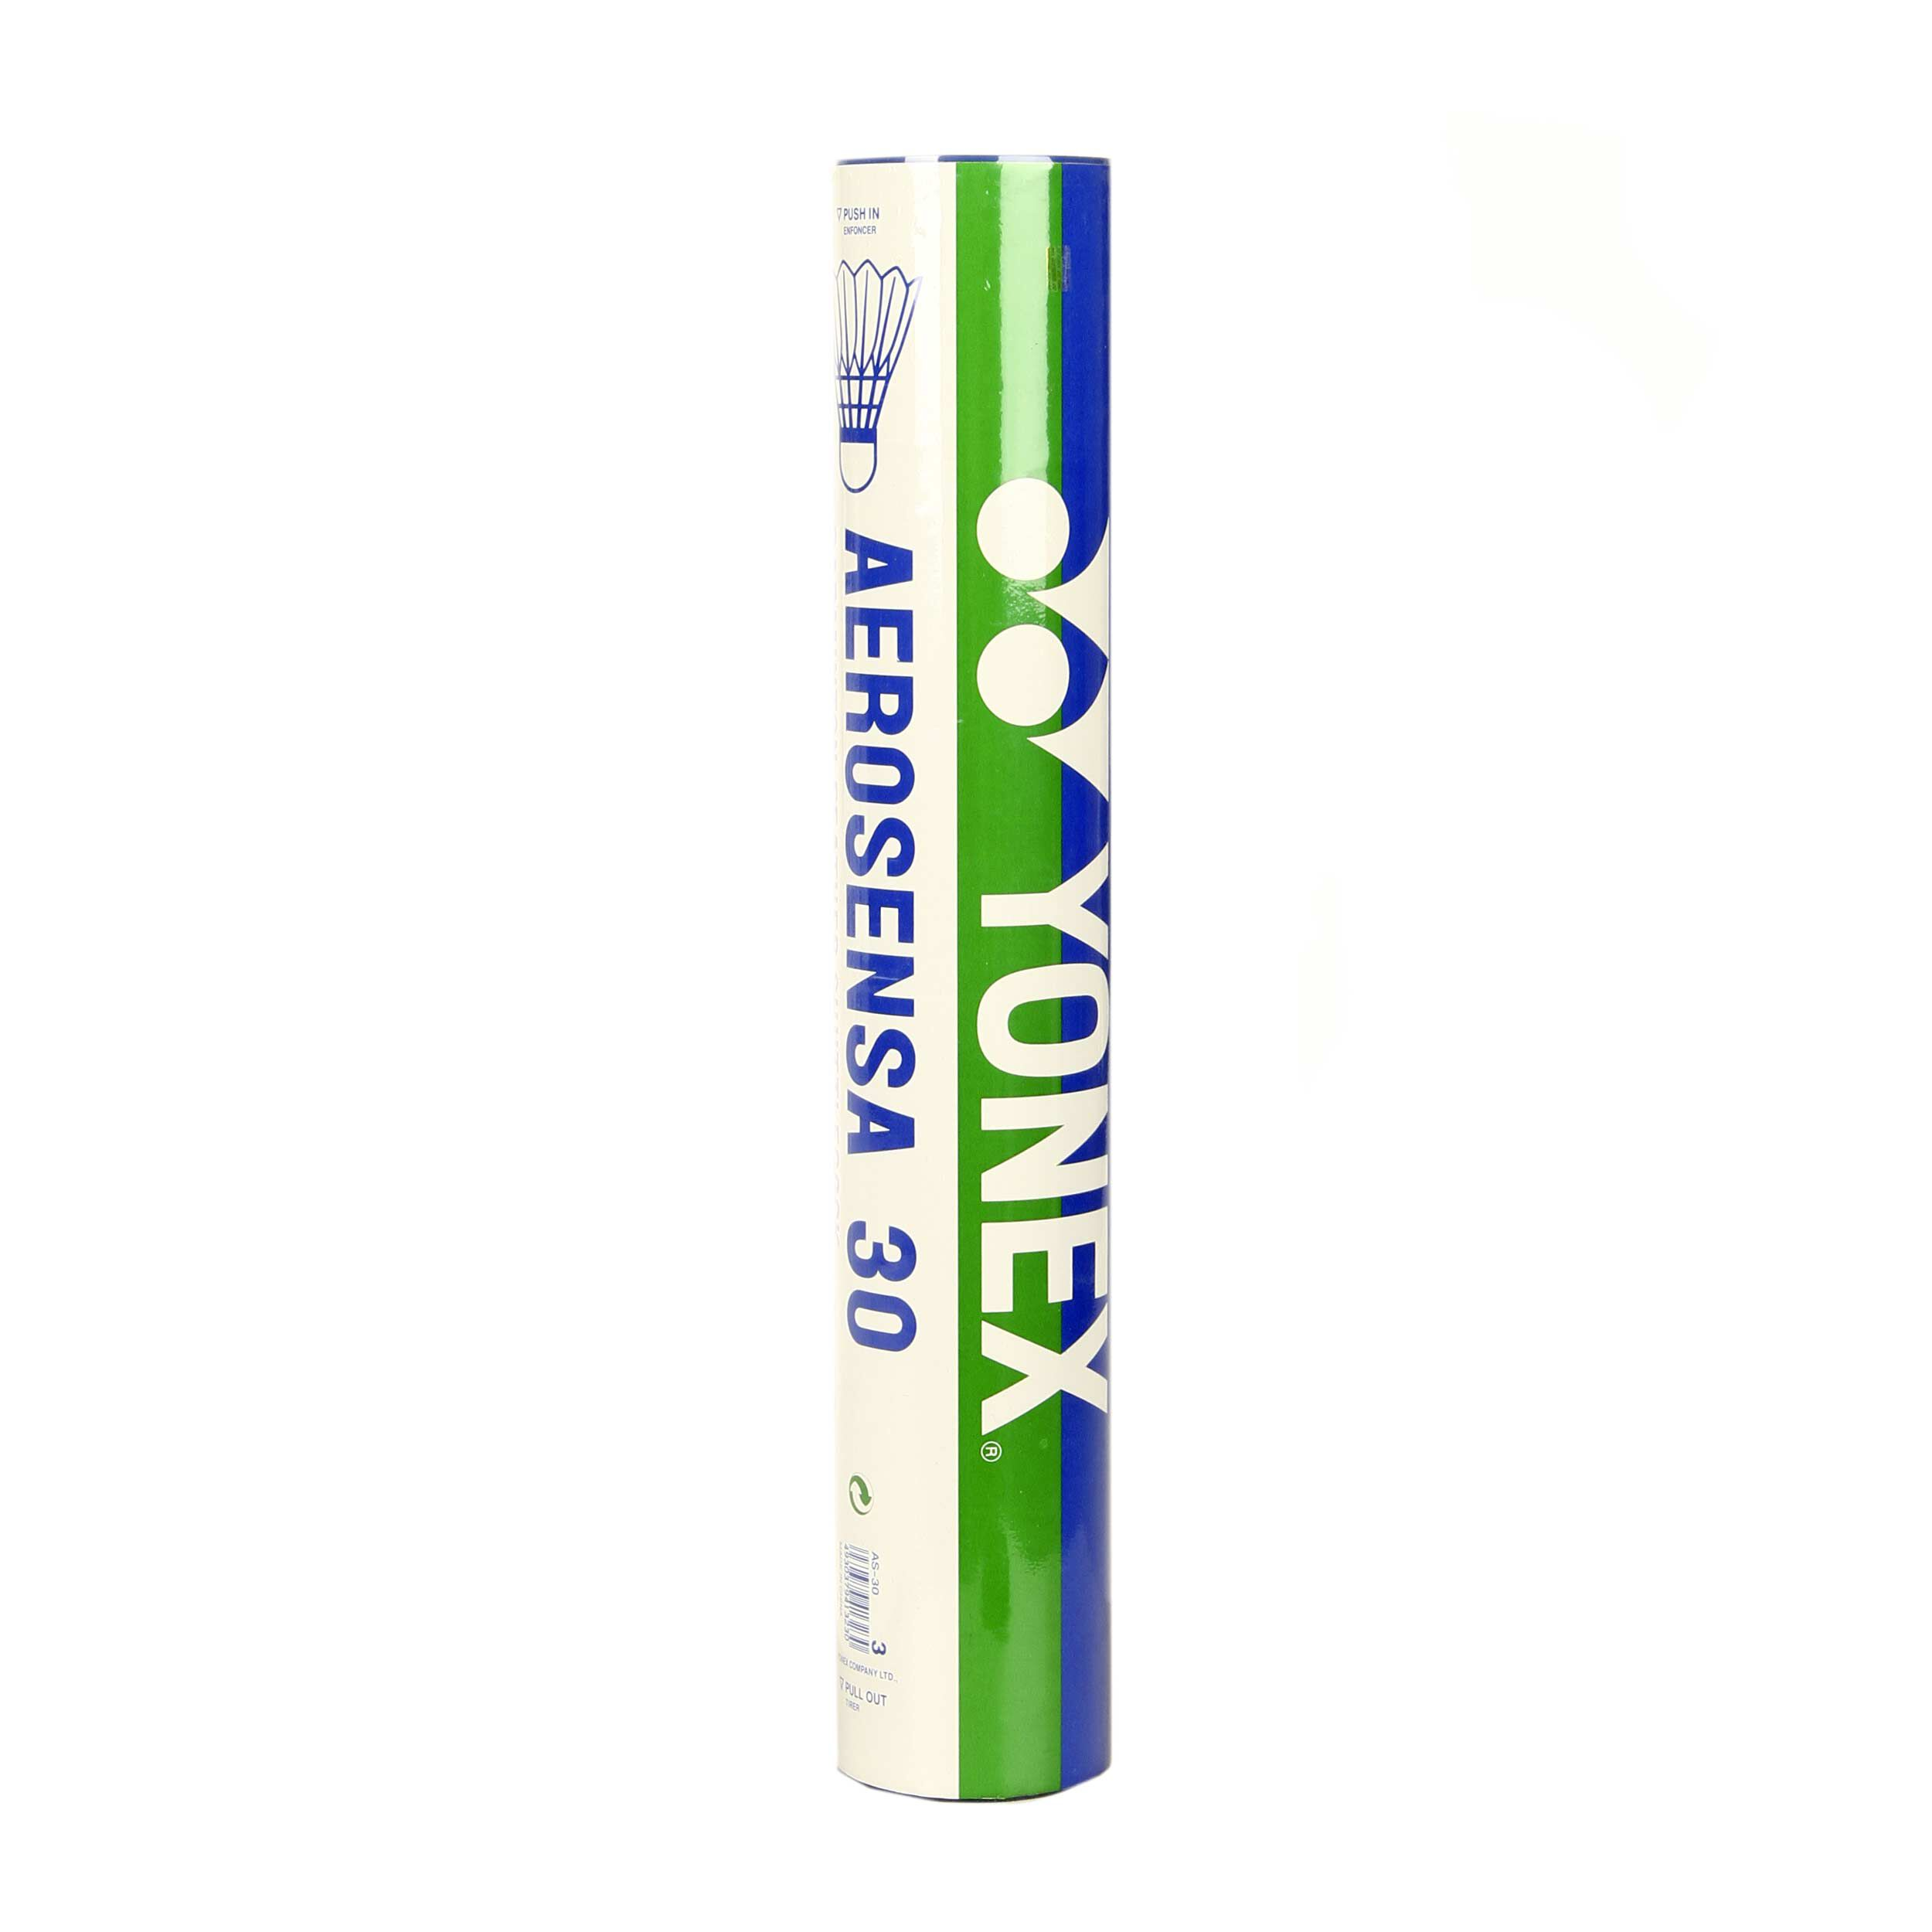 Yonex Aerosensa 30 Naturball 3 Mittel Tennisbälle 12er Pack NEU